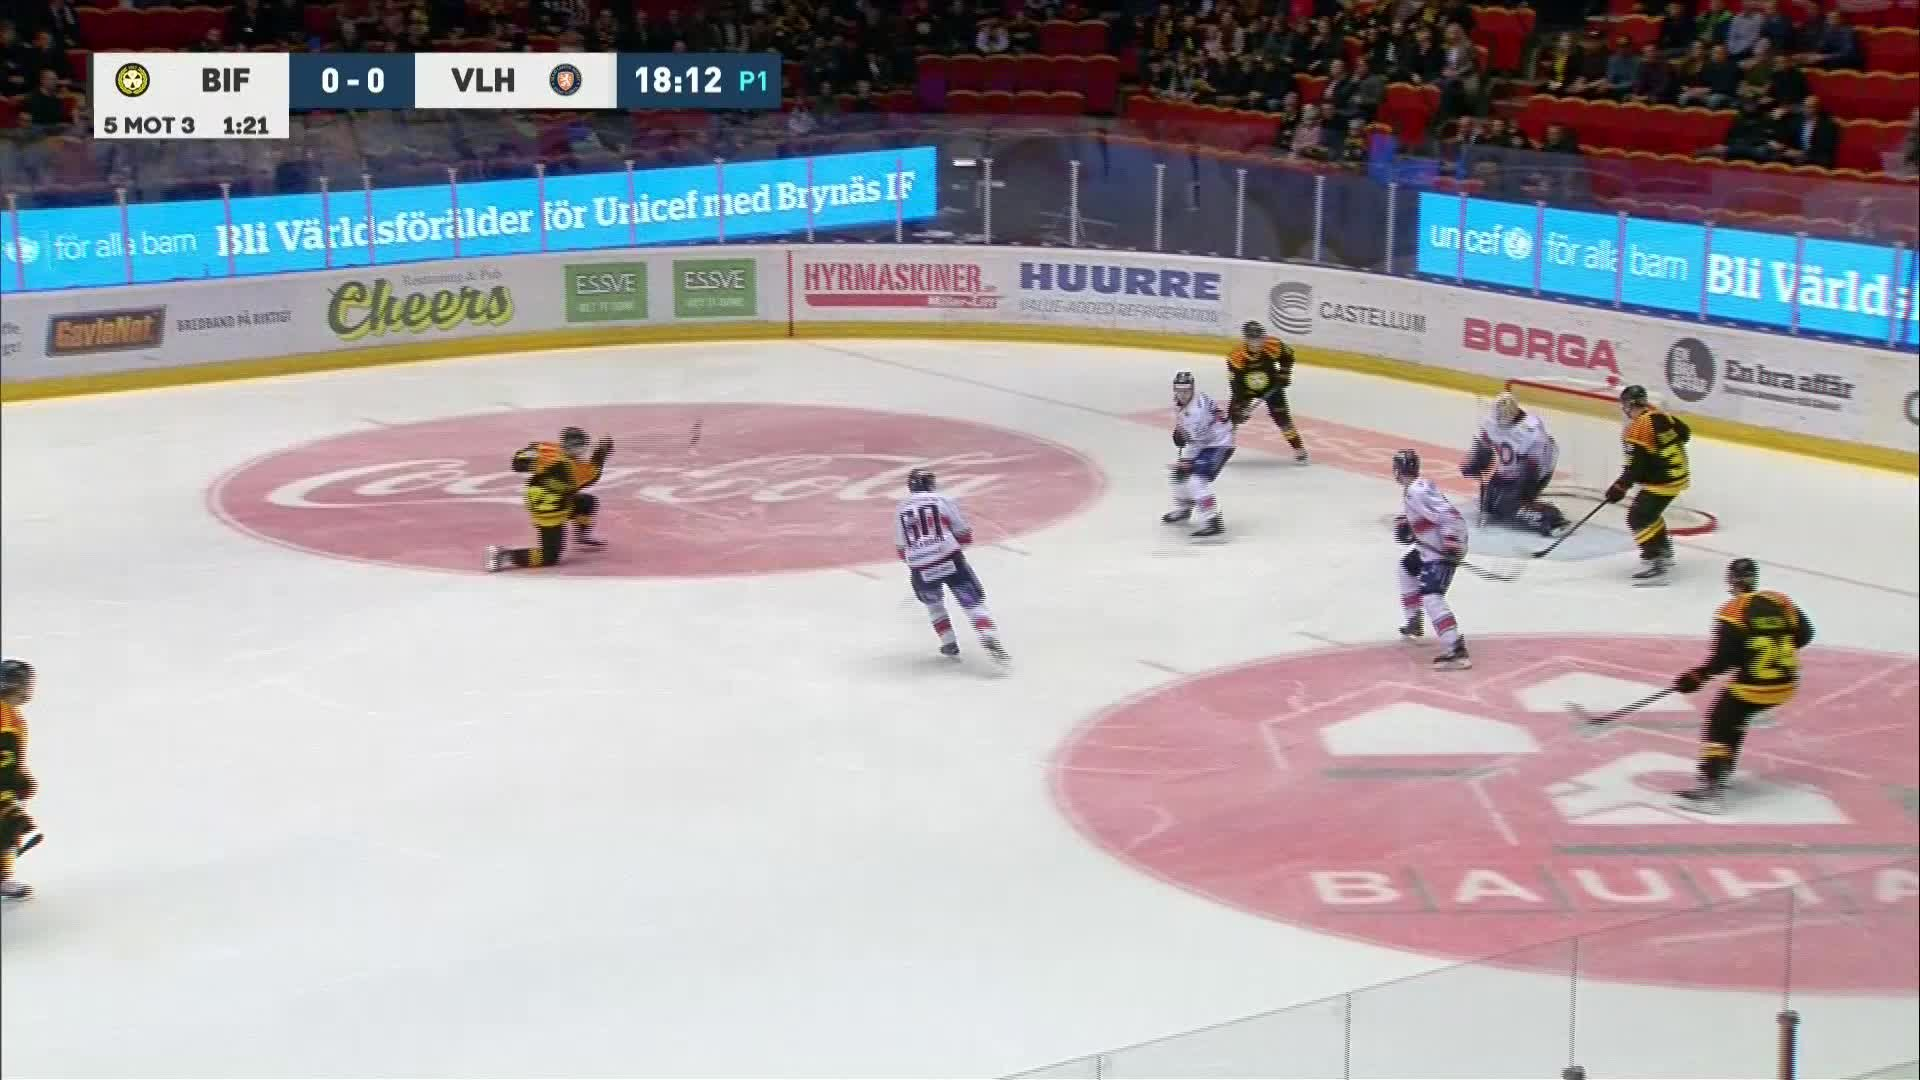 Brynäs IF - Växjö Lakers 1-0